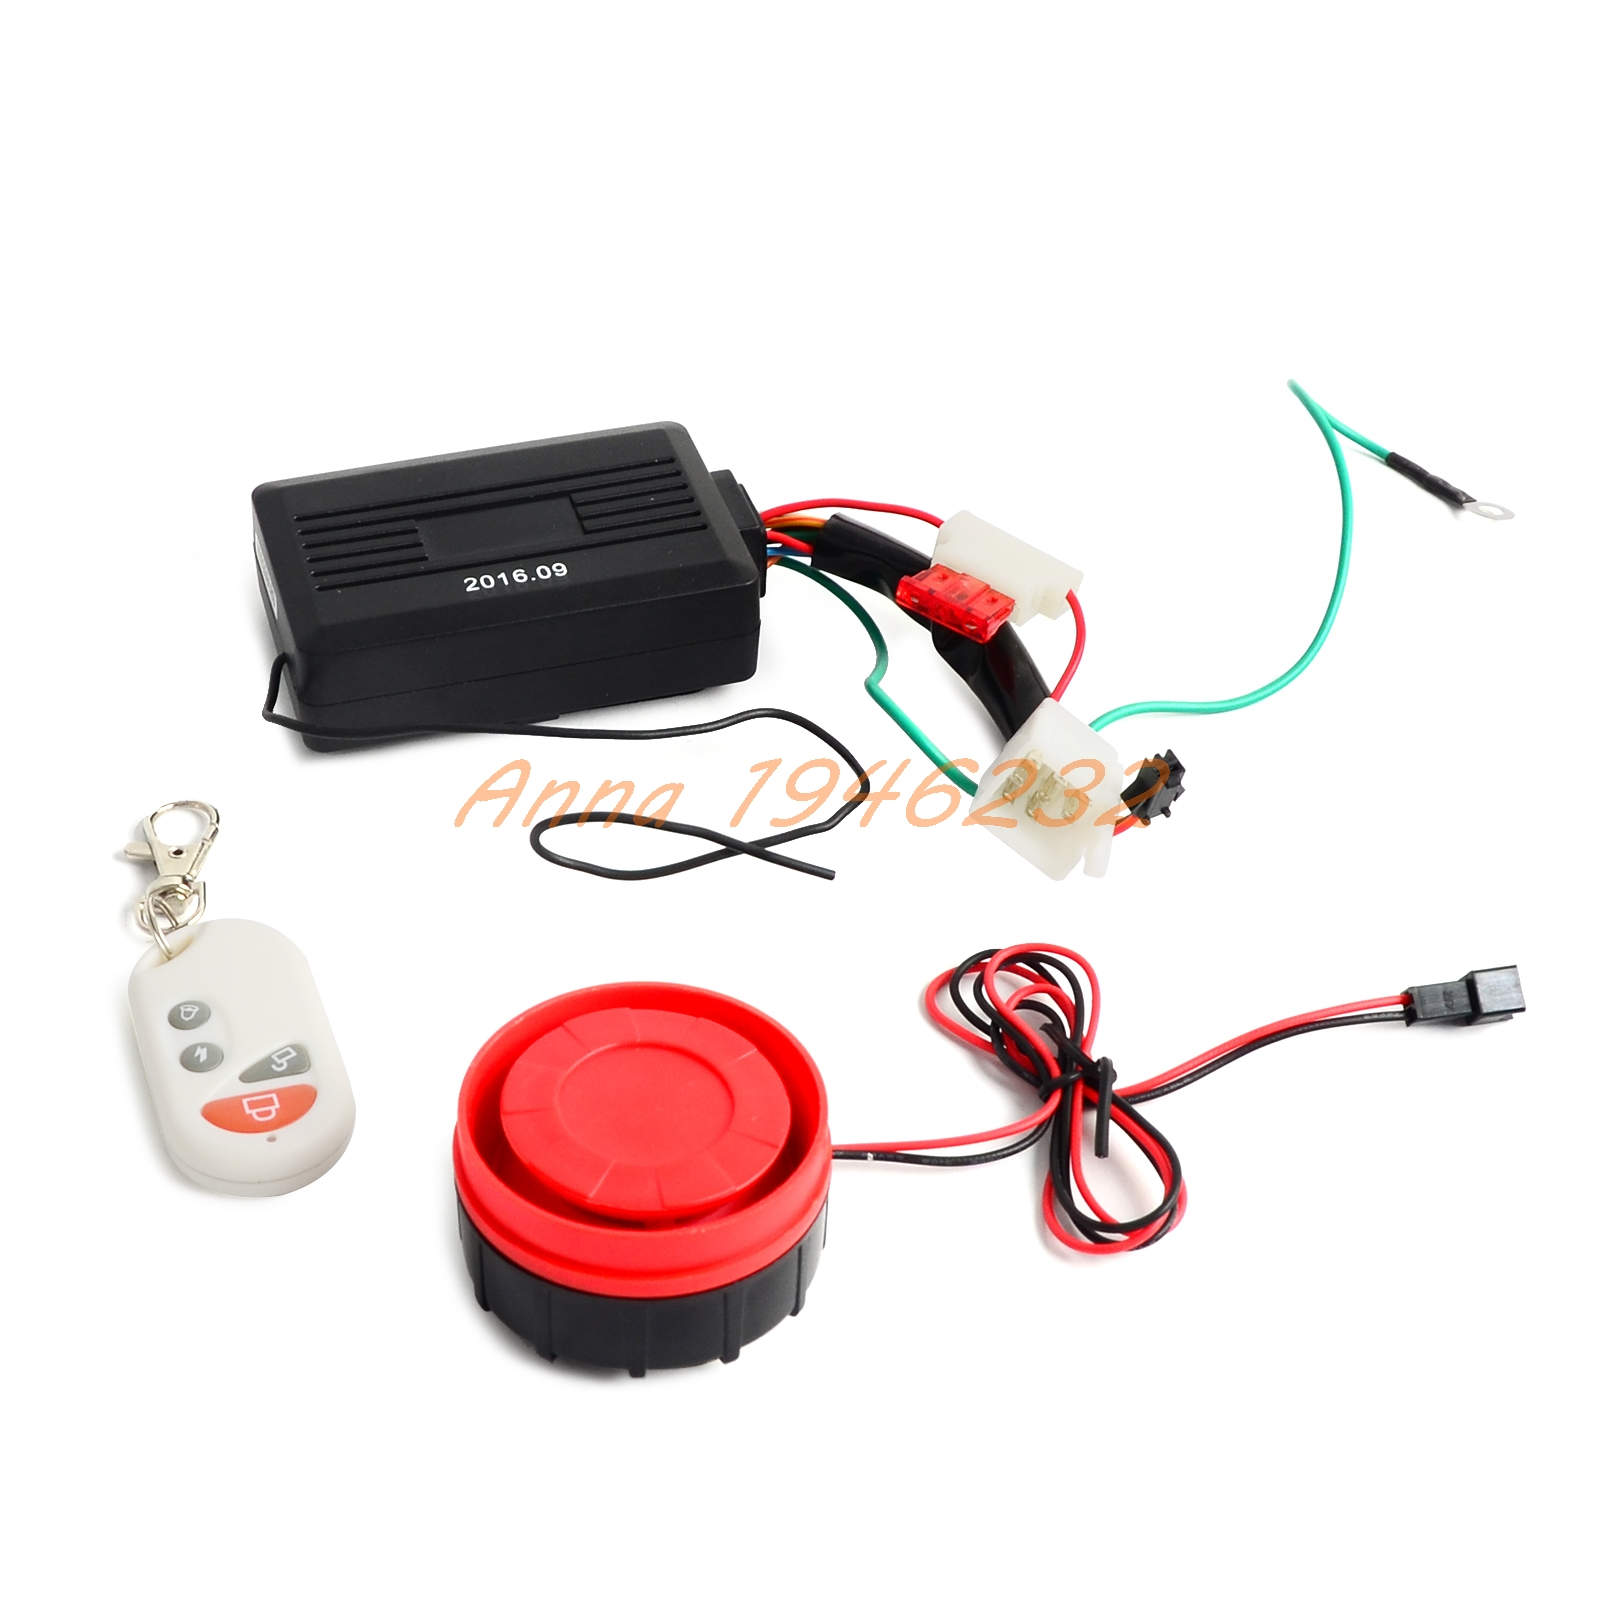 WRG-5531] Kill Remote Control Atv Wiring